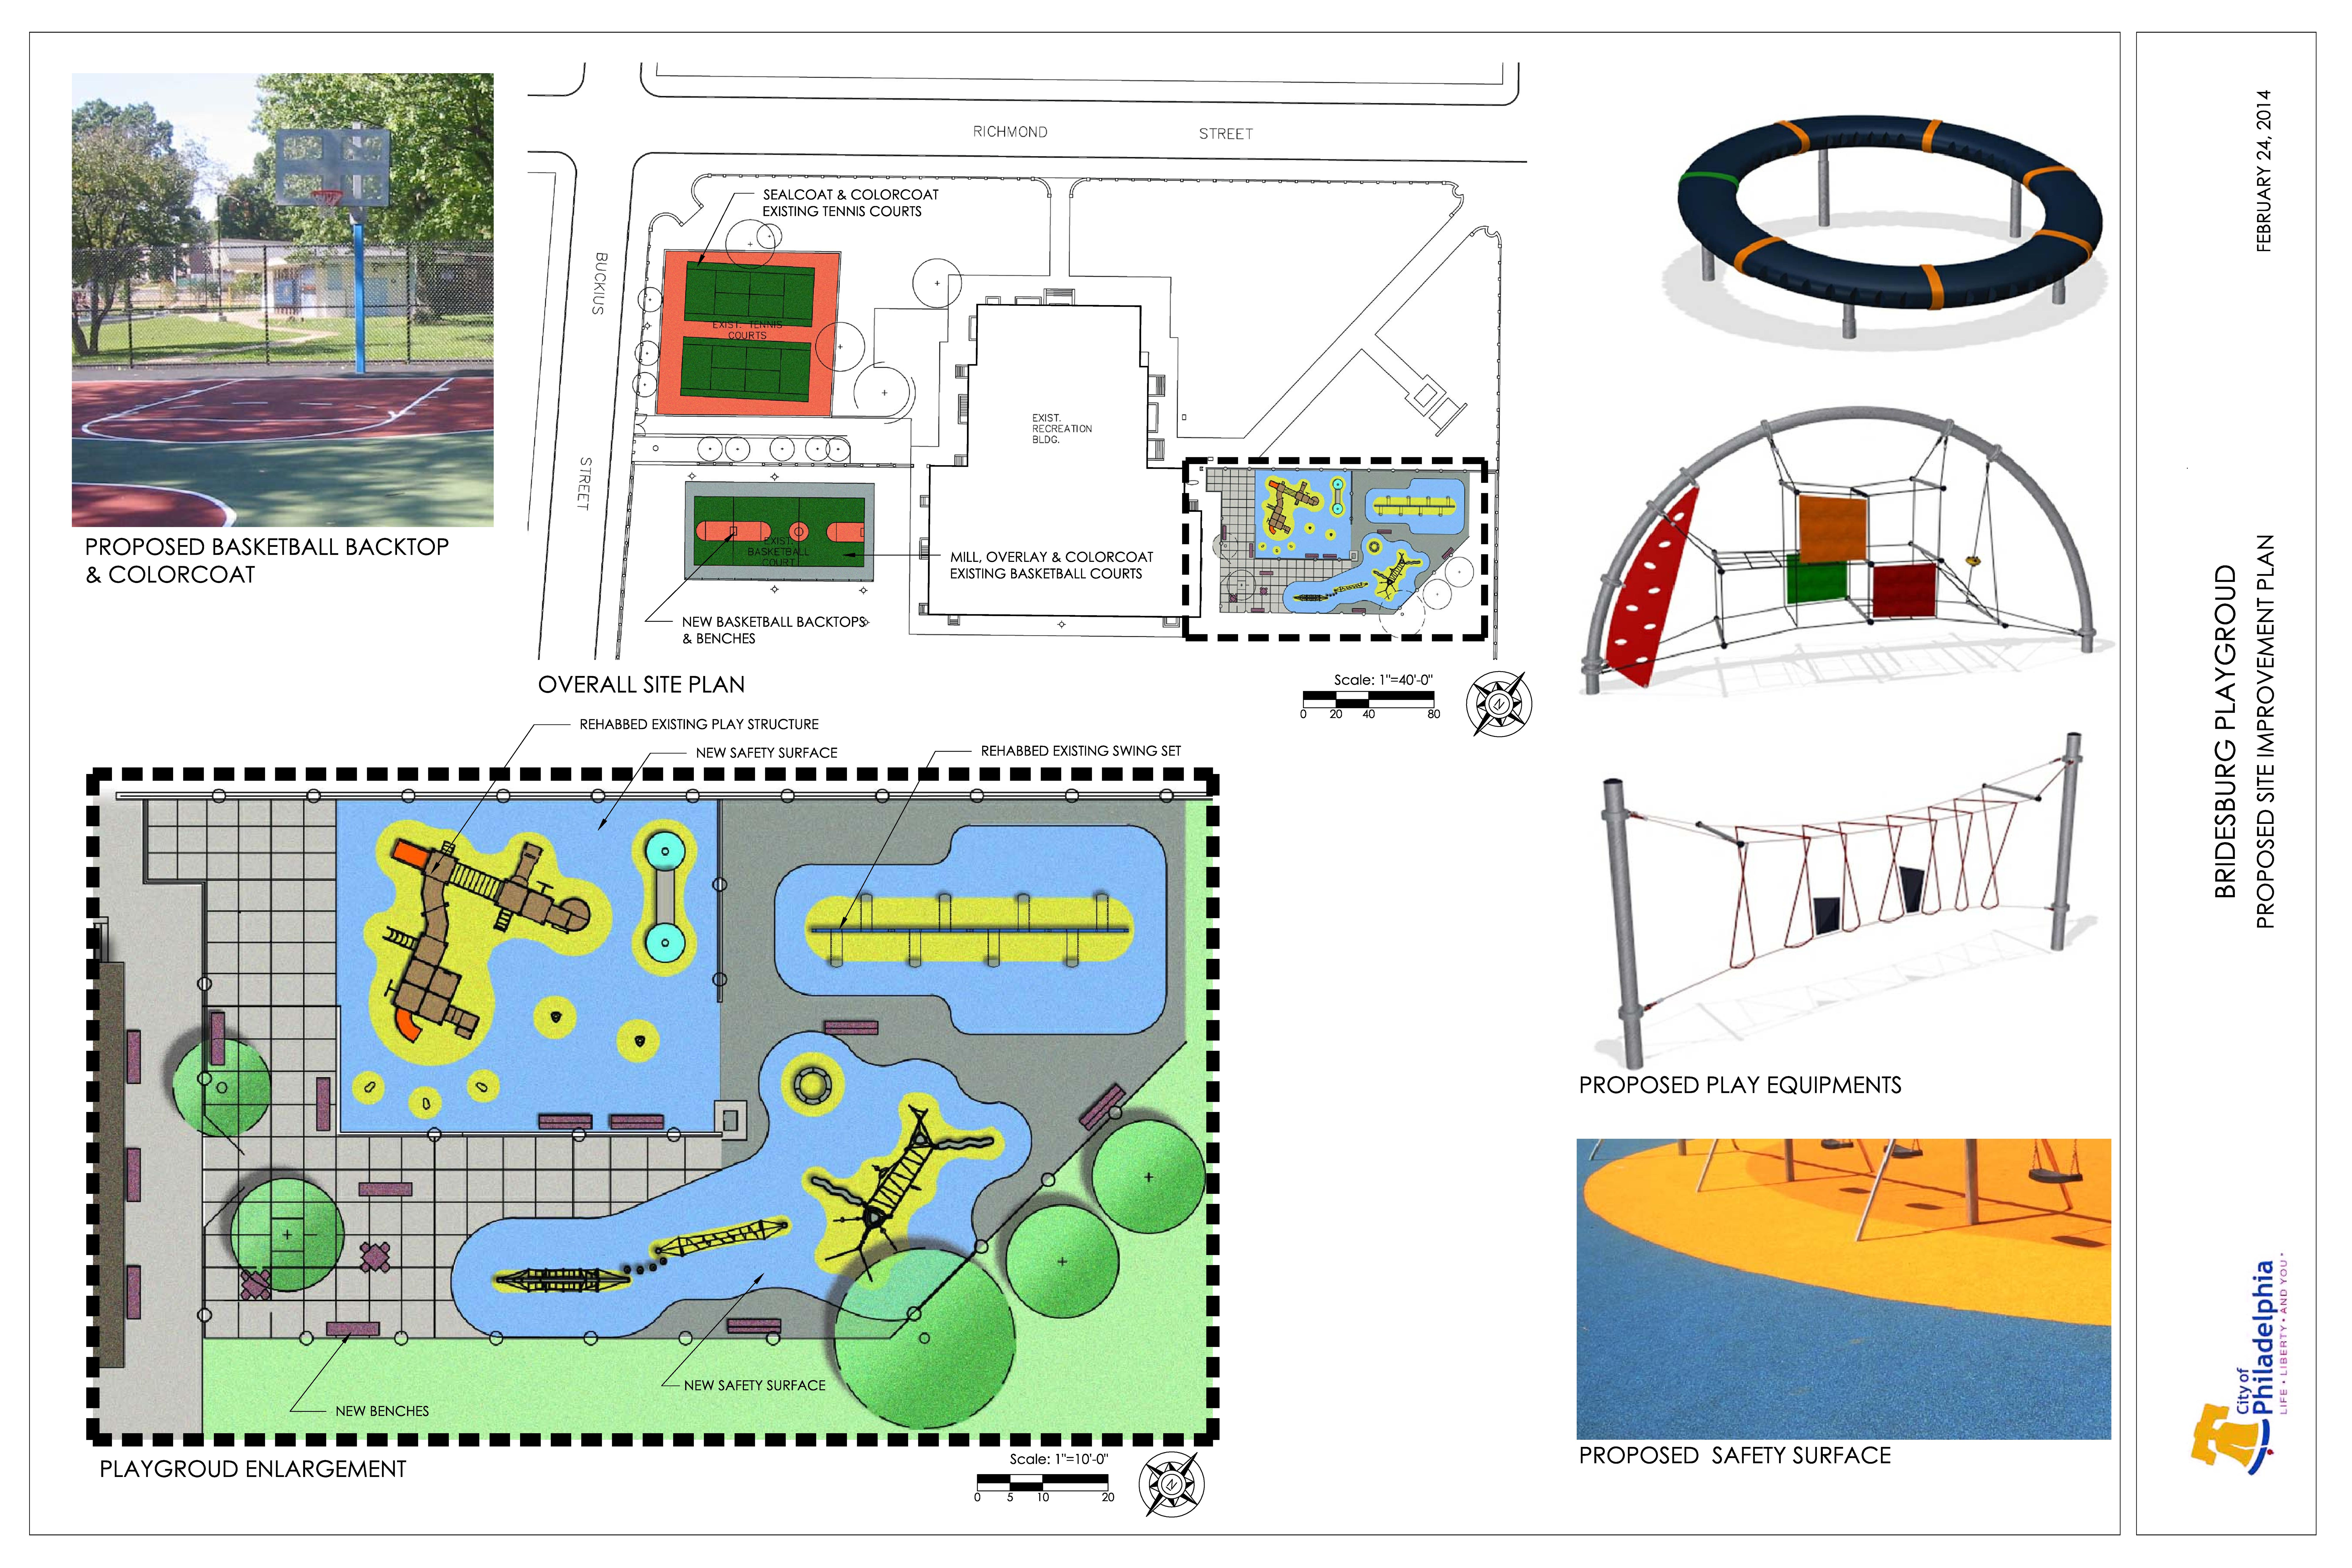 BRIDESBURG_Presentation-2014-02-24-page-001.jpg